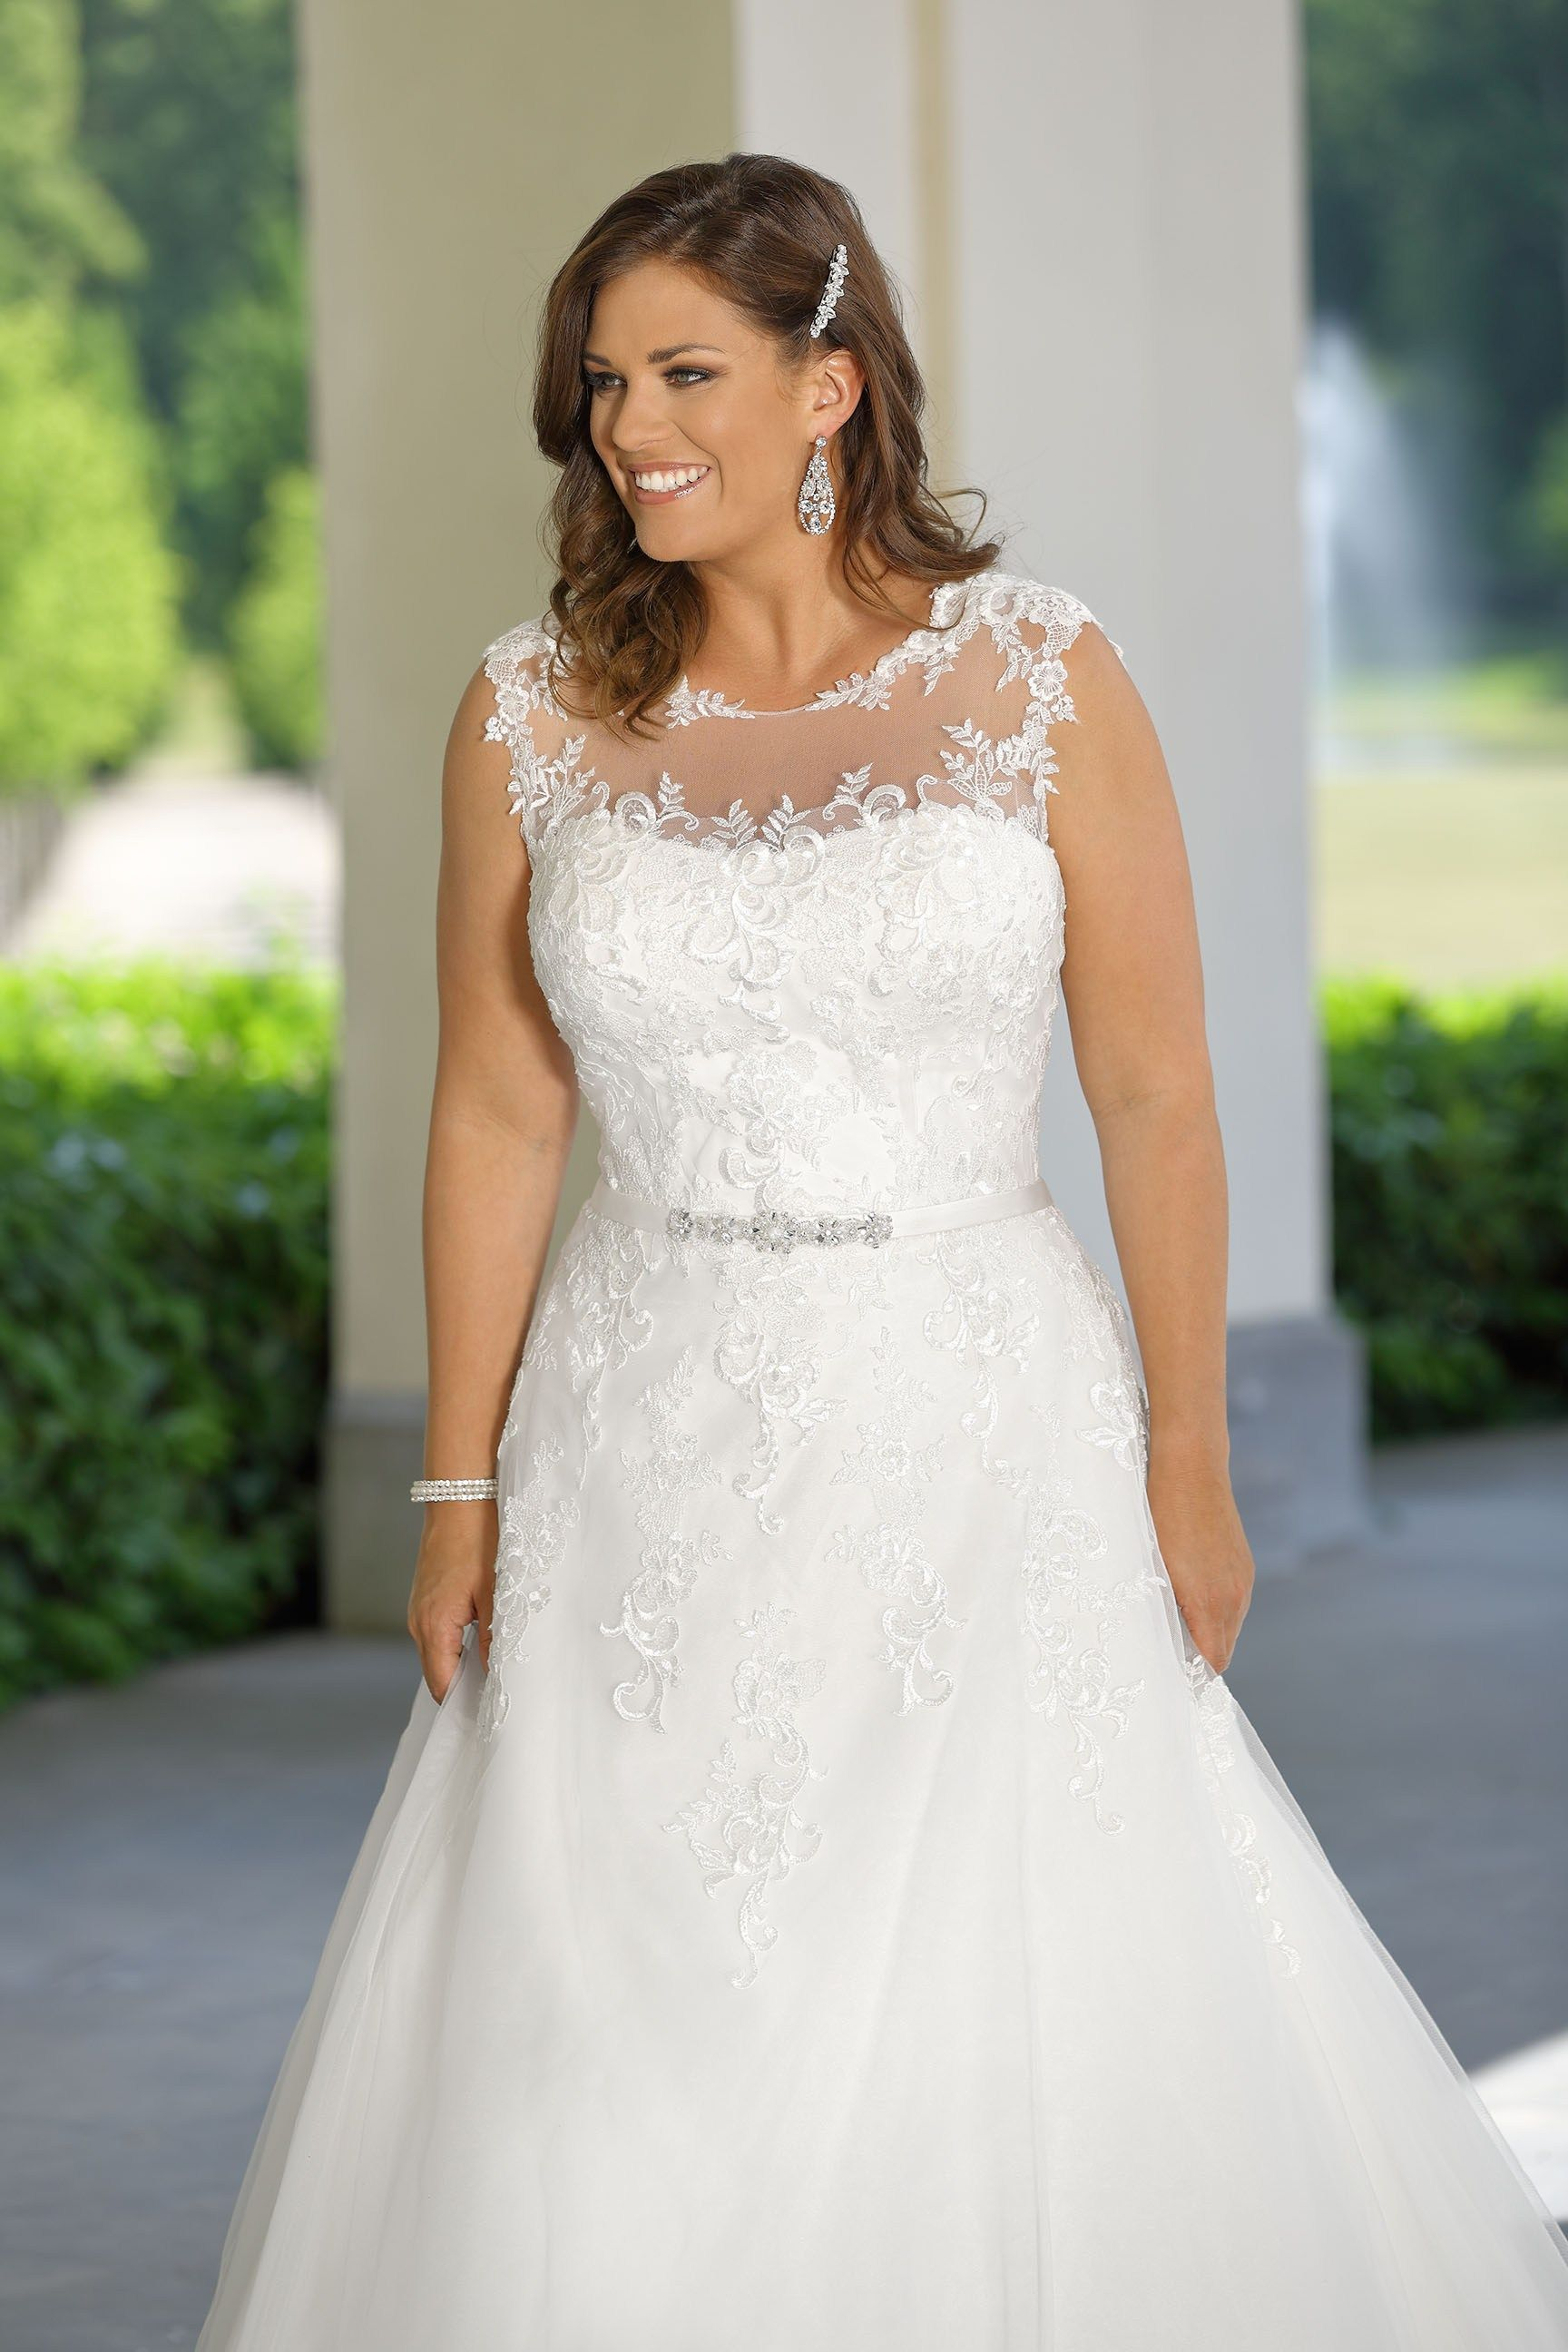 56 Unique Plus Sizes Wedding Dresses Pics Curvy wedding